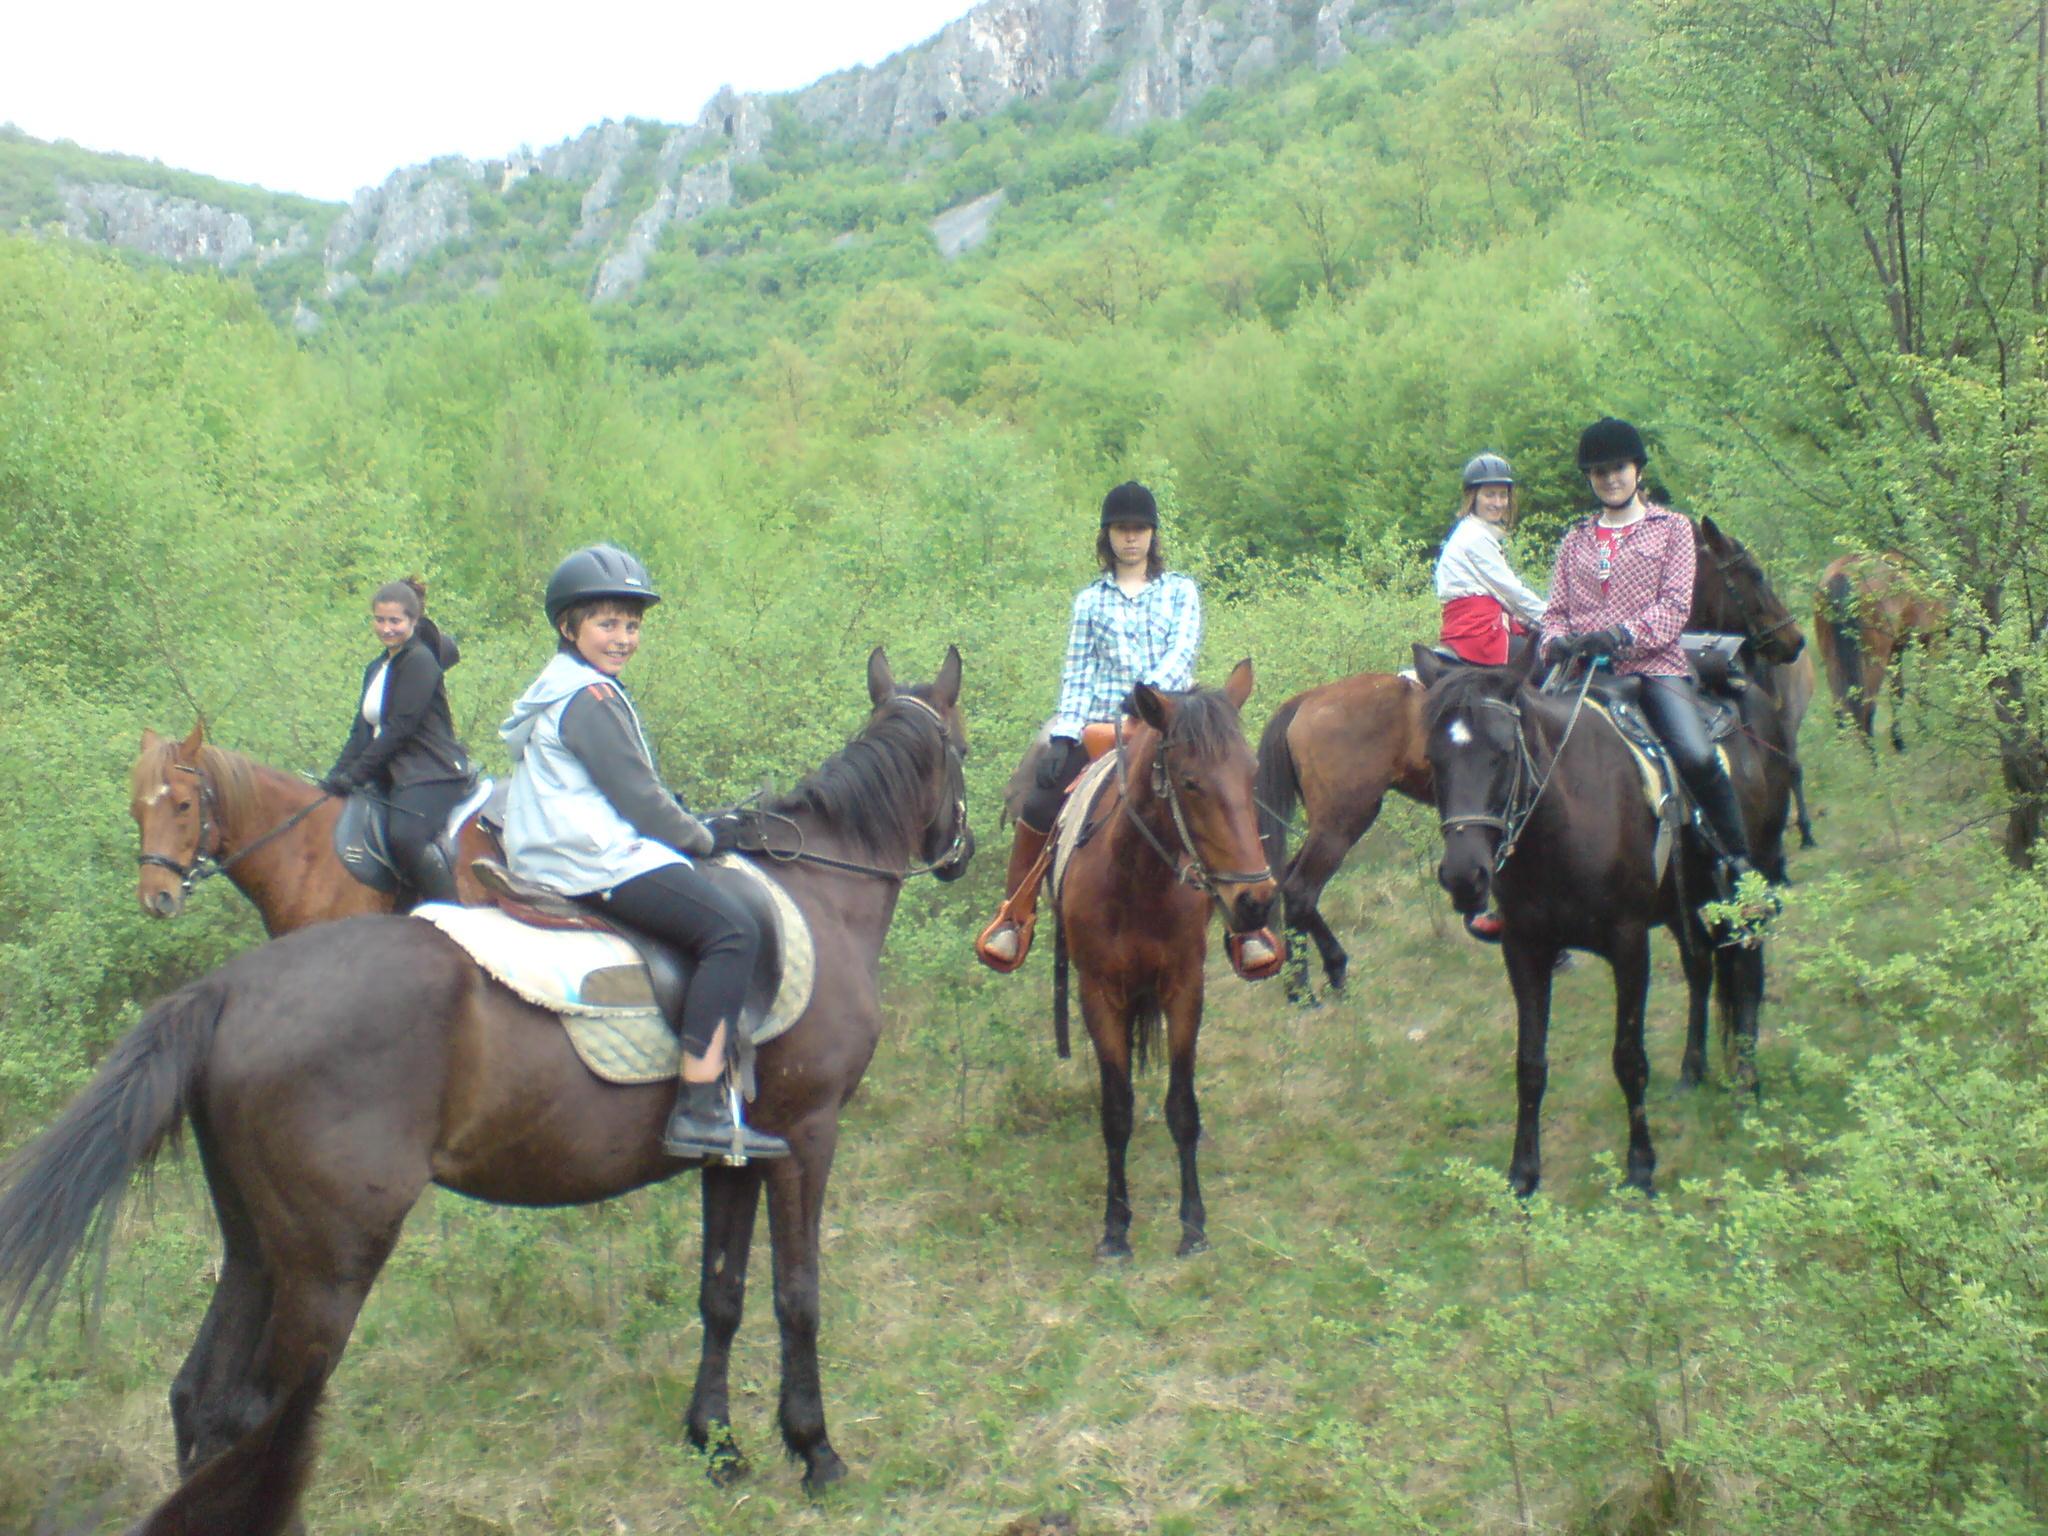 Family zikata 39 s blog for Places to go horseback riding near me